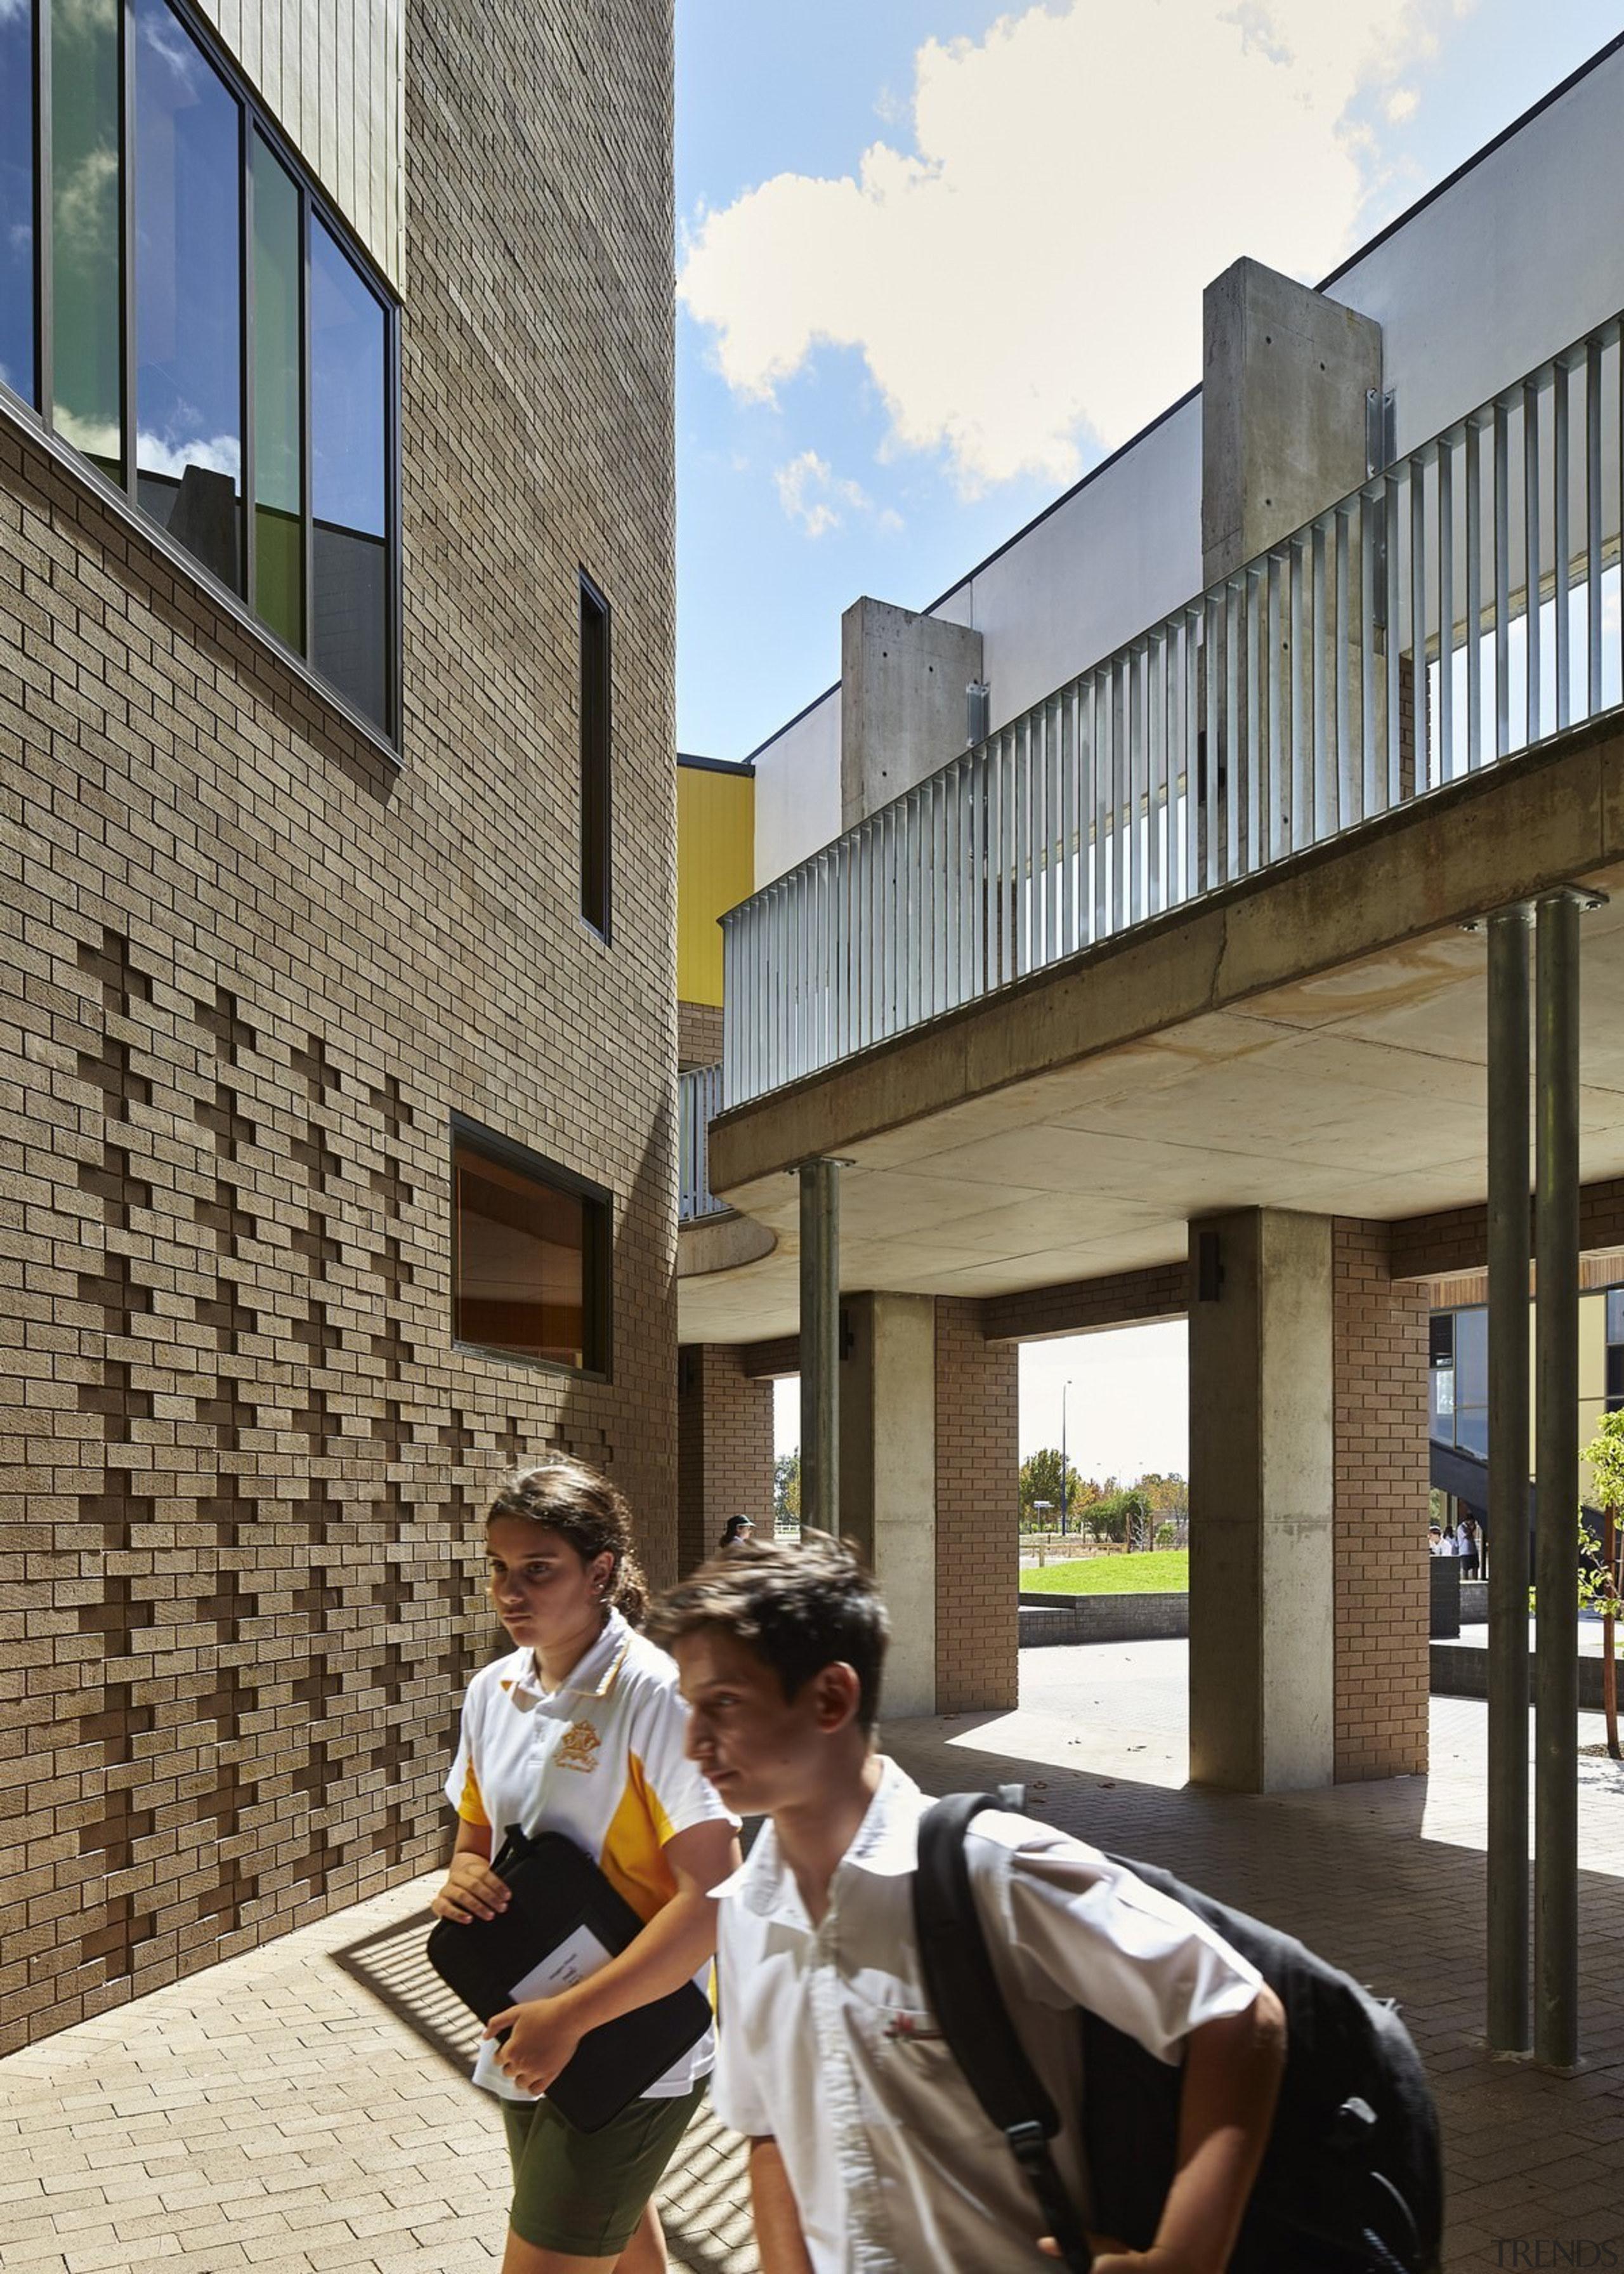 Bunbury Catholic College – Mercy Campus - Bunbury architecture, building, city, house, real estate, gray, black